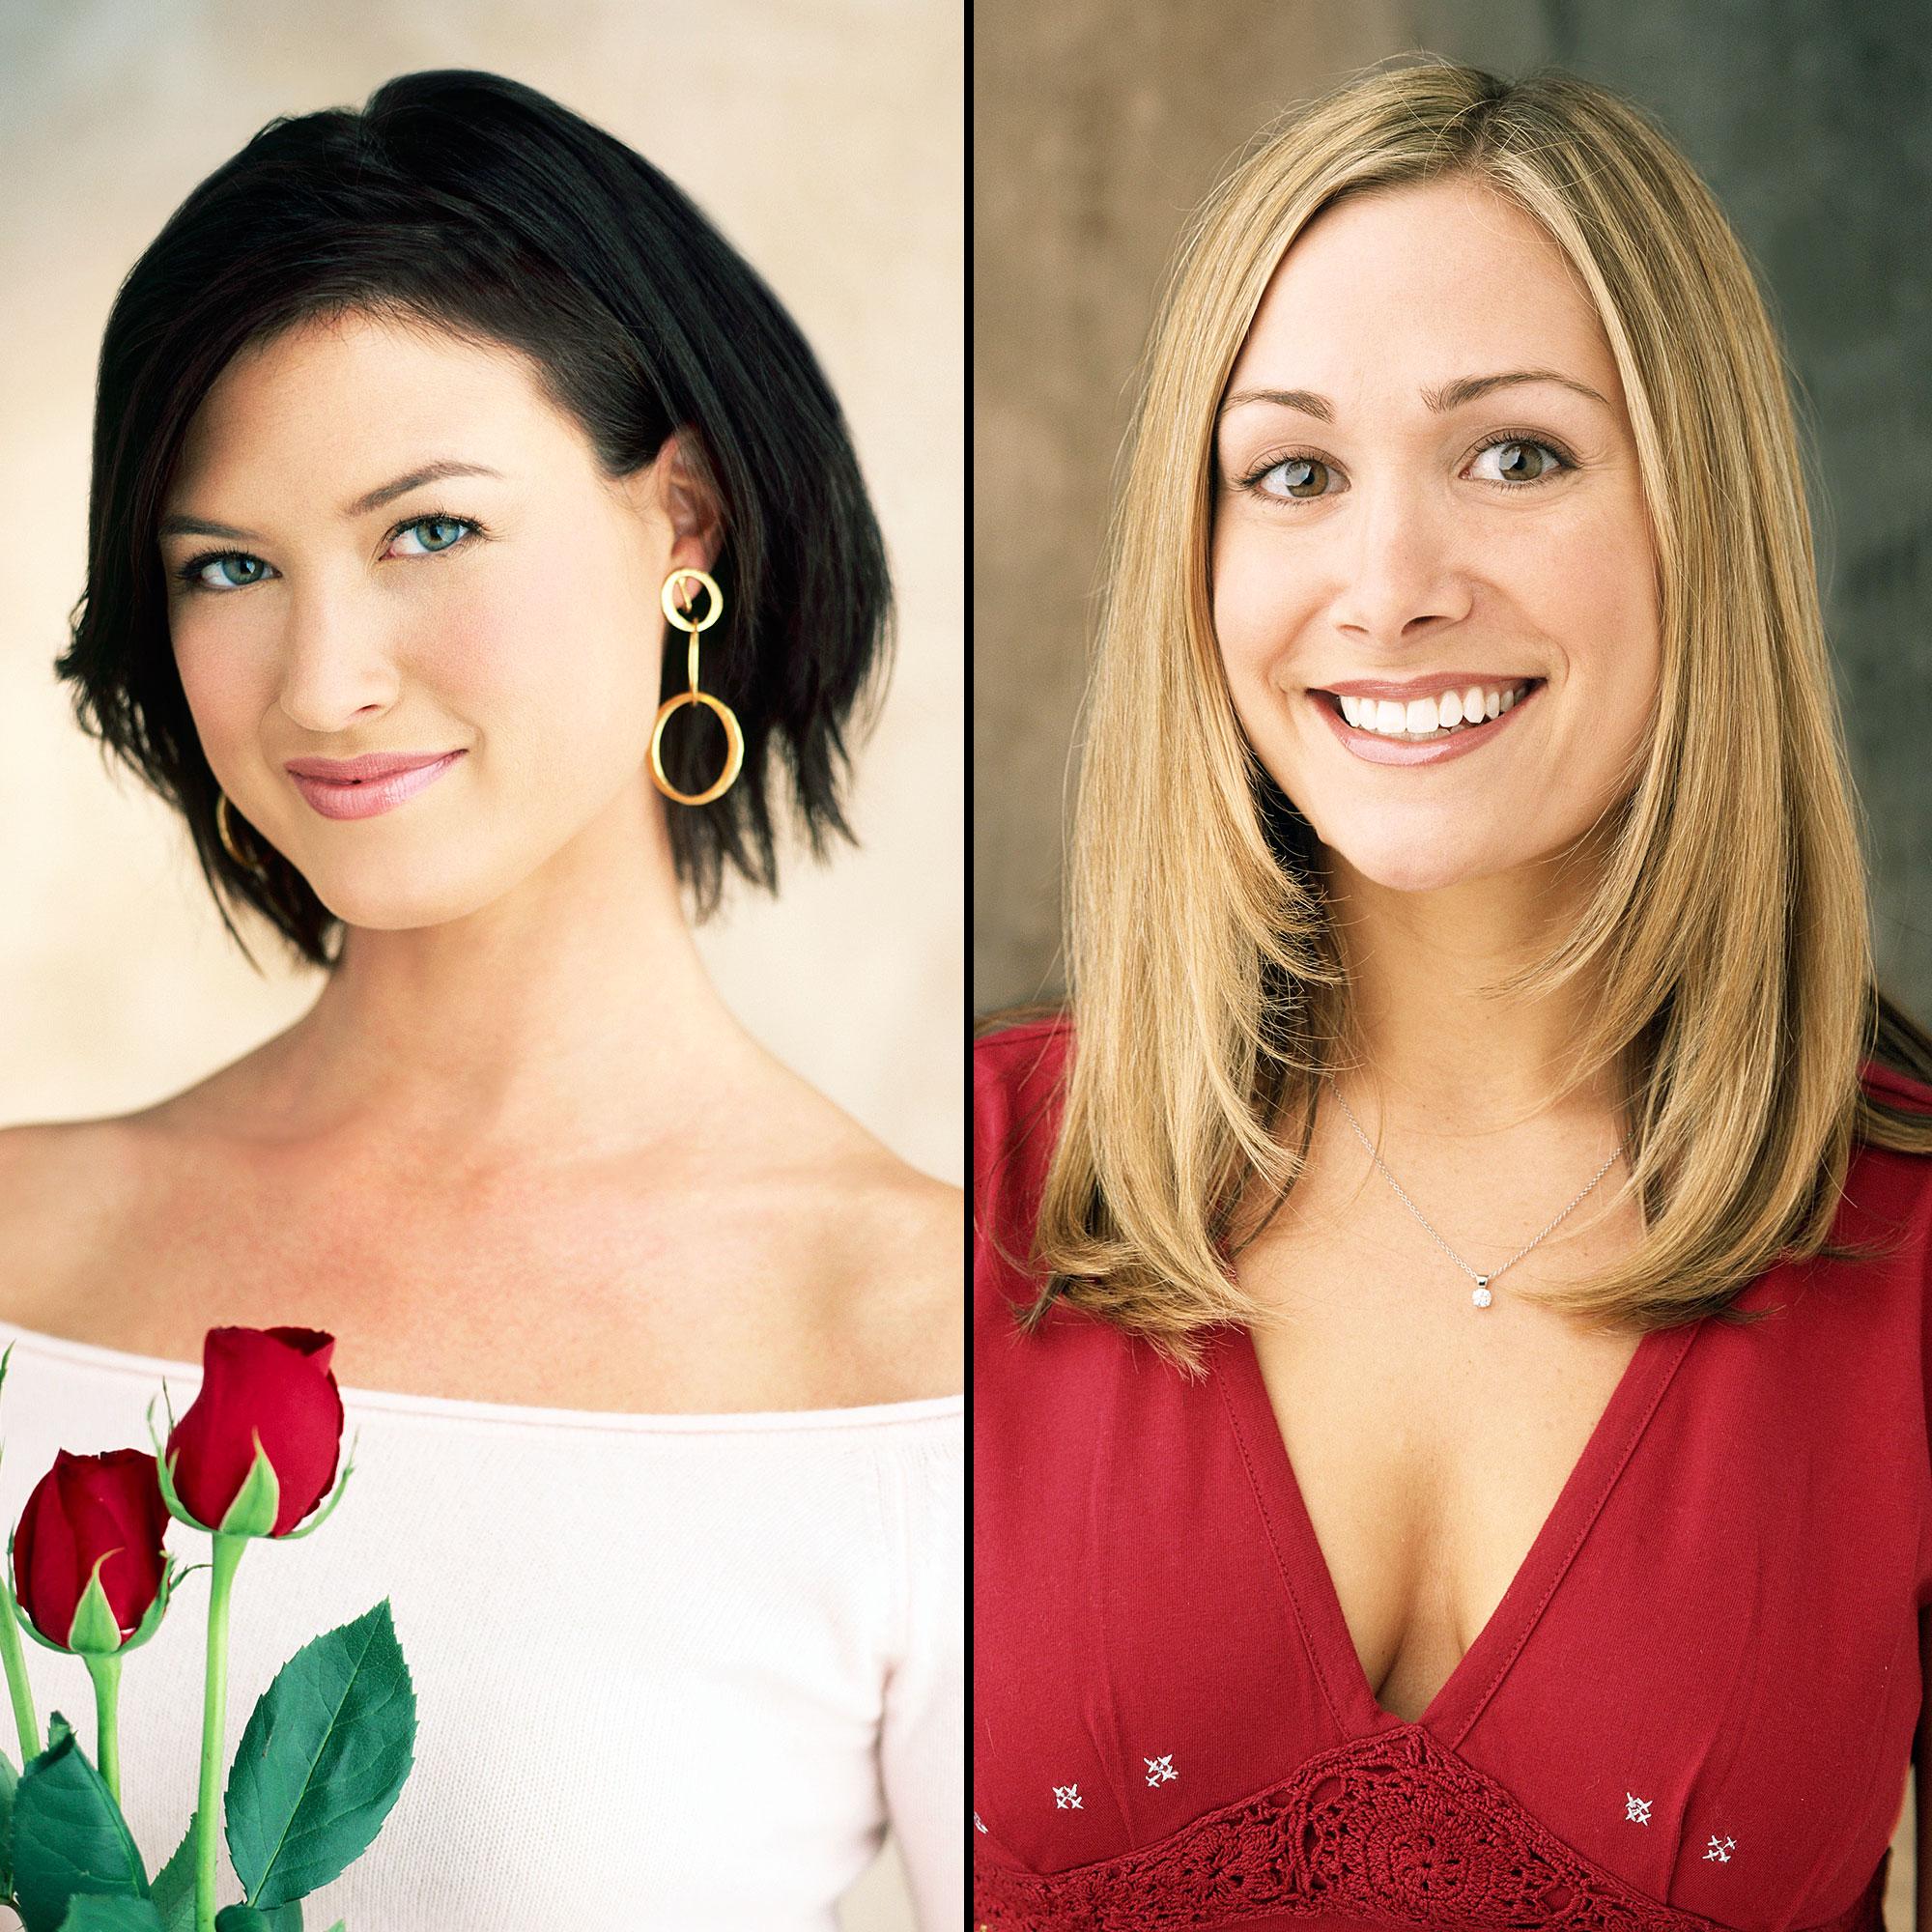 The Bachelorette Reunion Meredith Philips Jen Schefft Missing - Meredith Philips and Jen Schefft.